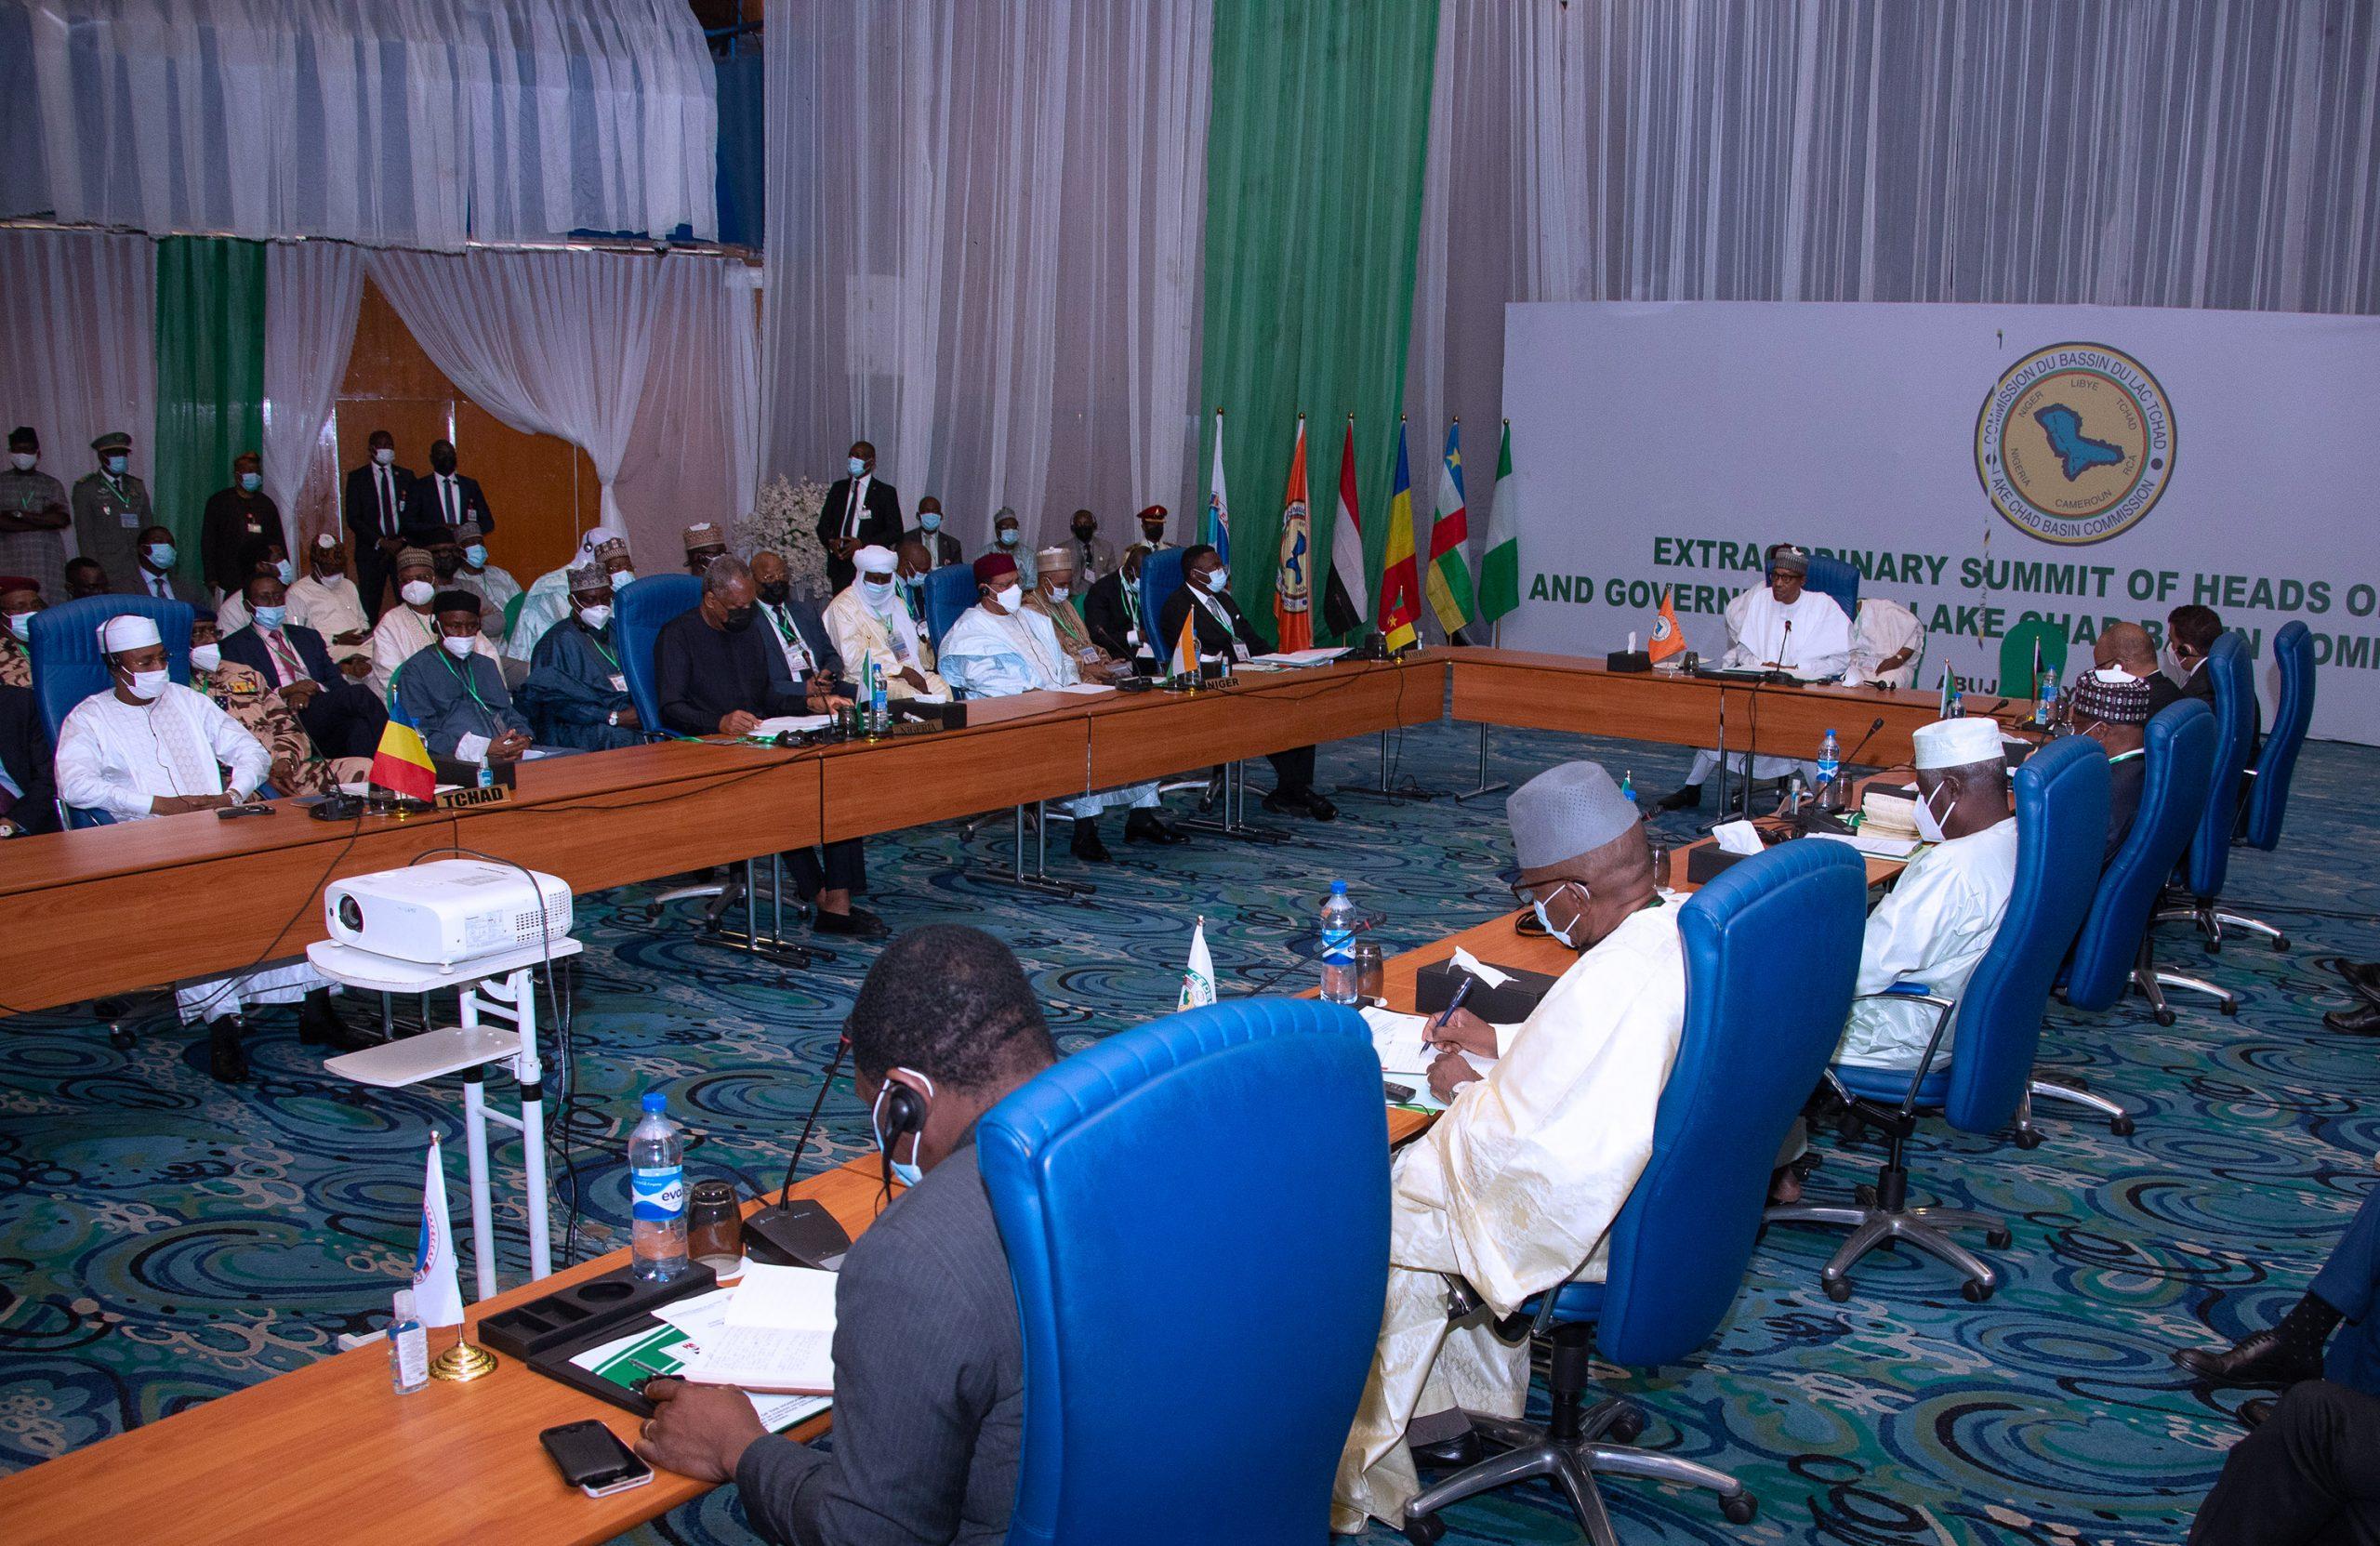 President Muhammadu Buhari Chairs the Extraordinary Summit of the Lake Chad Basin Commission (LCBC) held at the Transcorp Hilton Abuja. PHOTO; SUNDAY AGHAEZE. MAY 25TH 2021